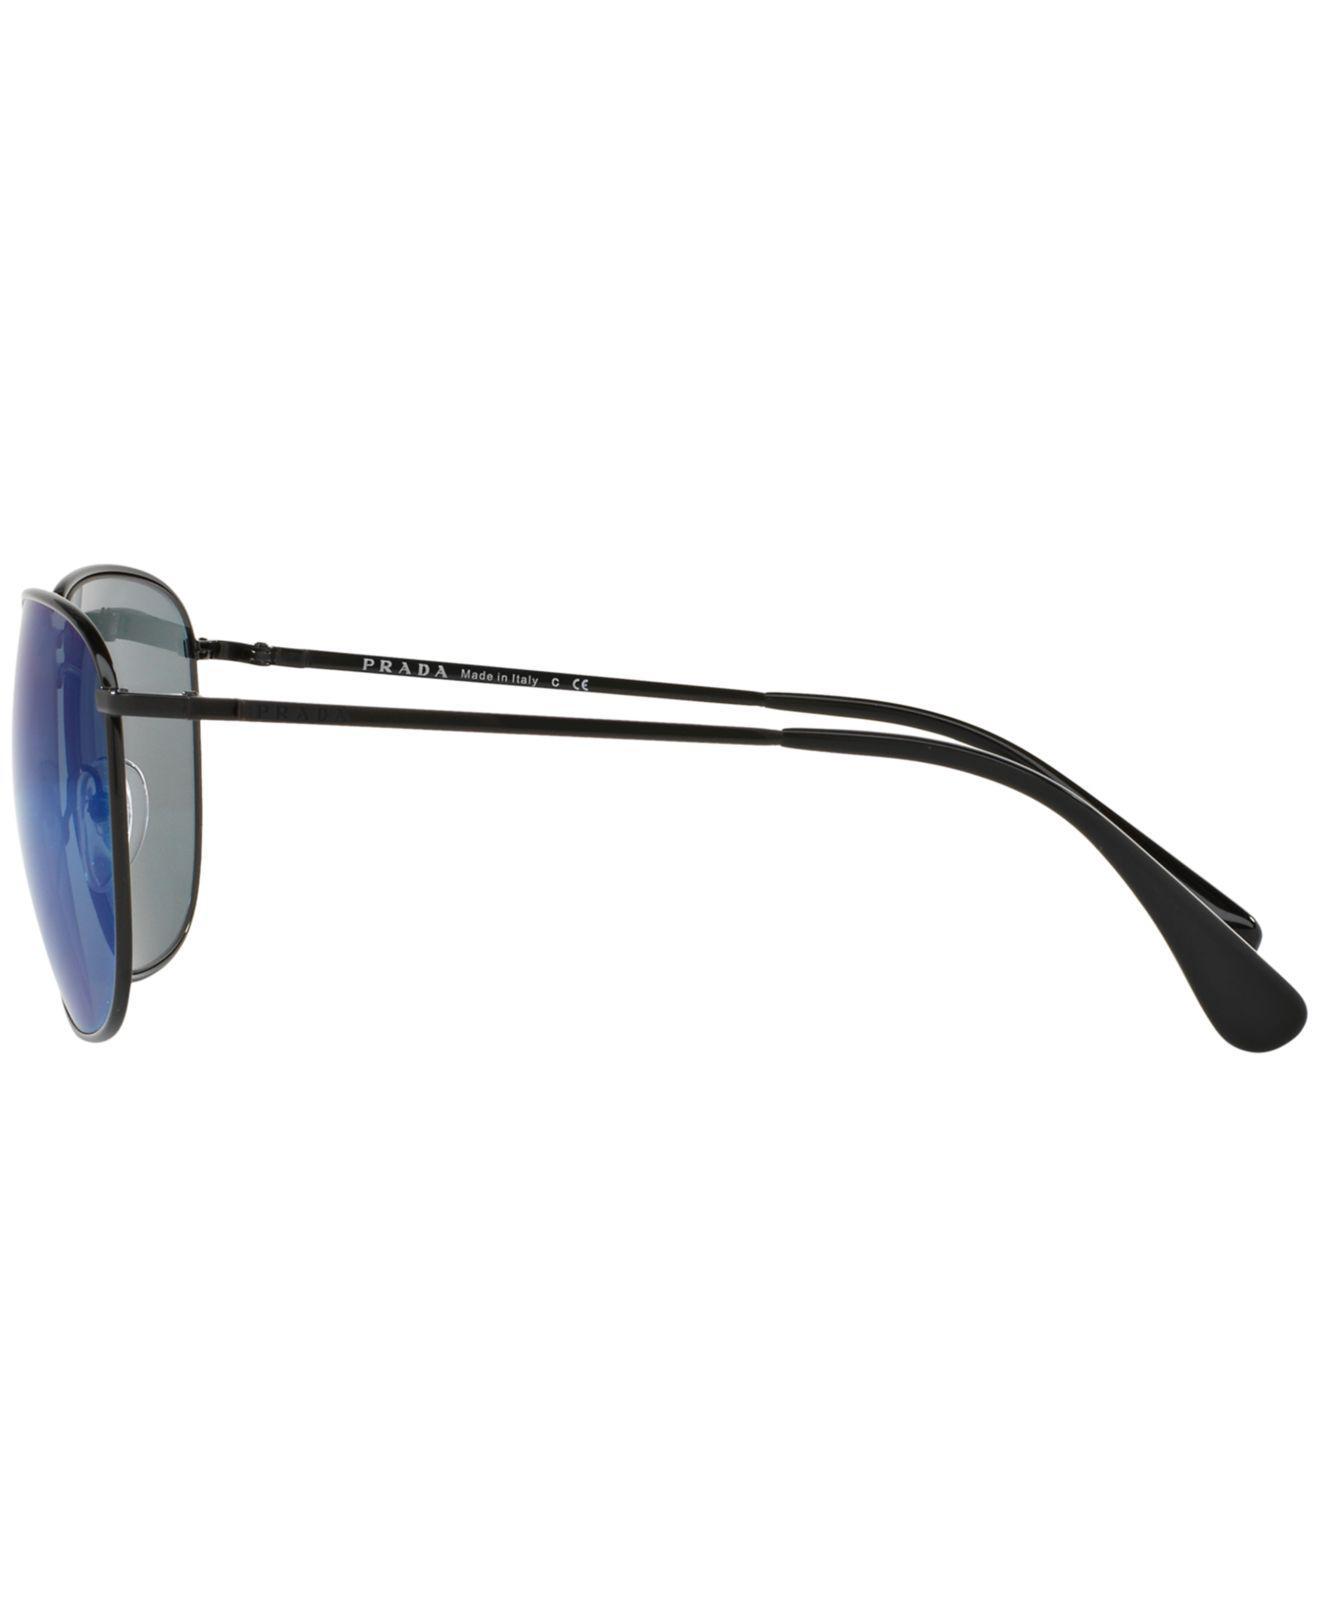 c812336f23456 ... denmark lyst prada sunglasses pr 52ts in blue for men a2c6c ad0ab